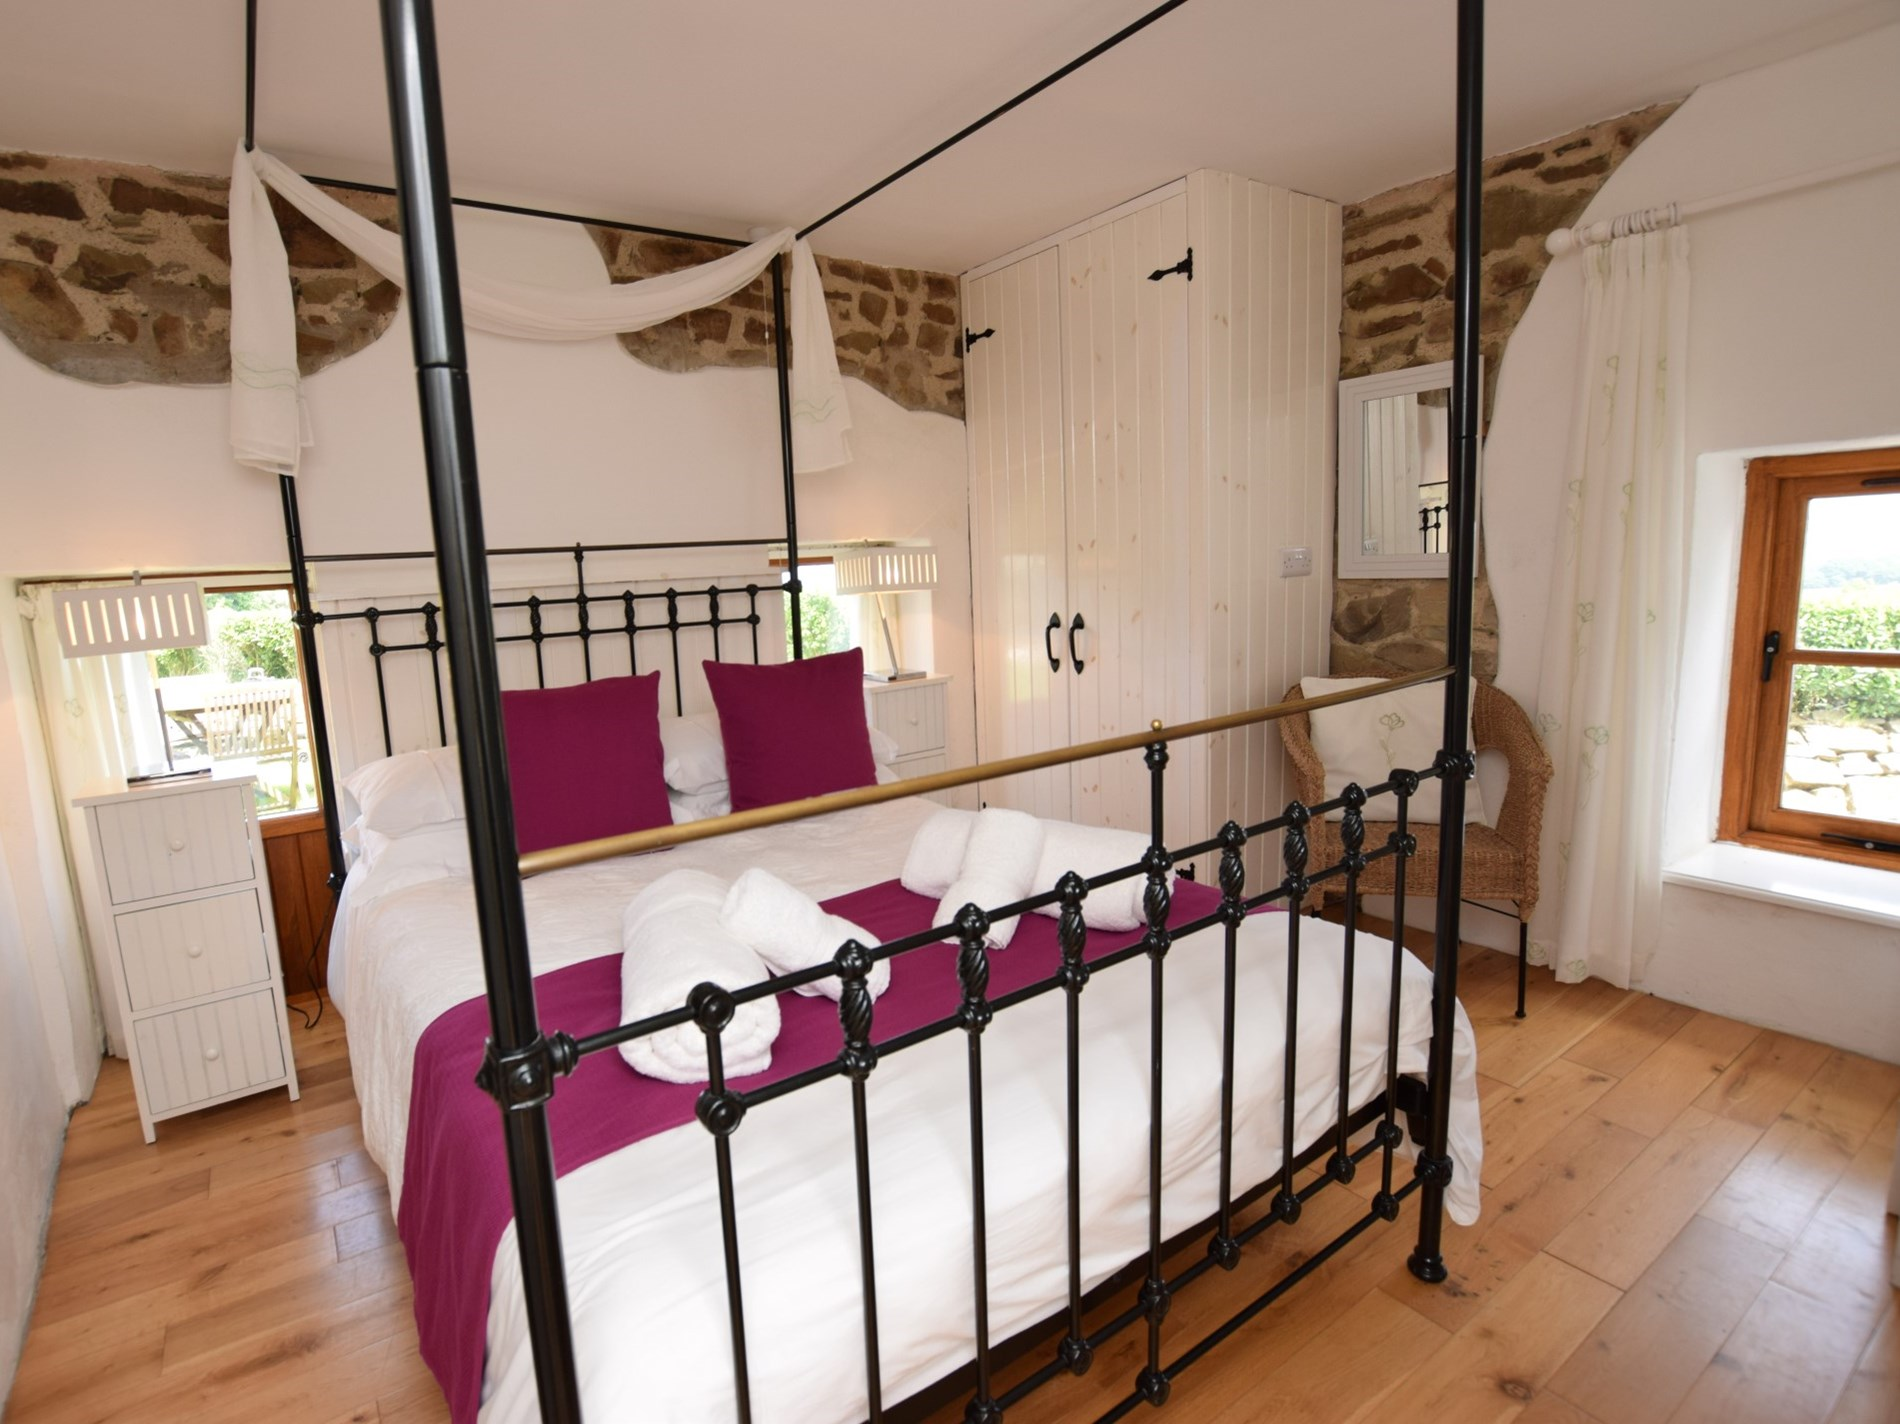 Double bedroom located on the ground floor